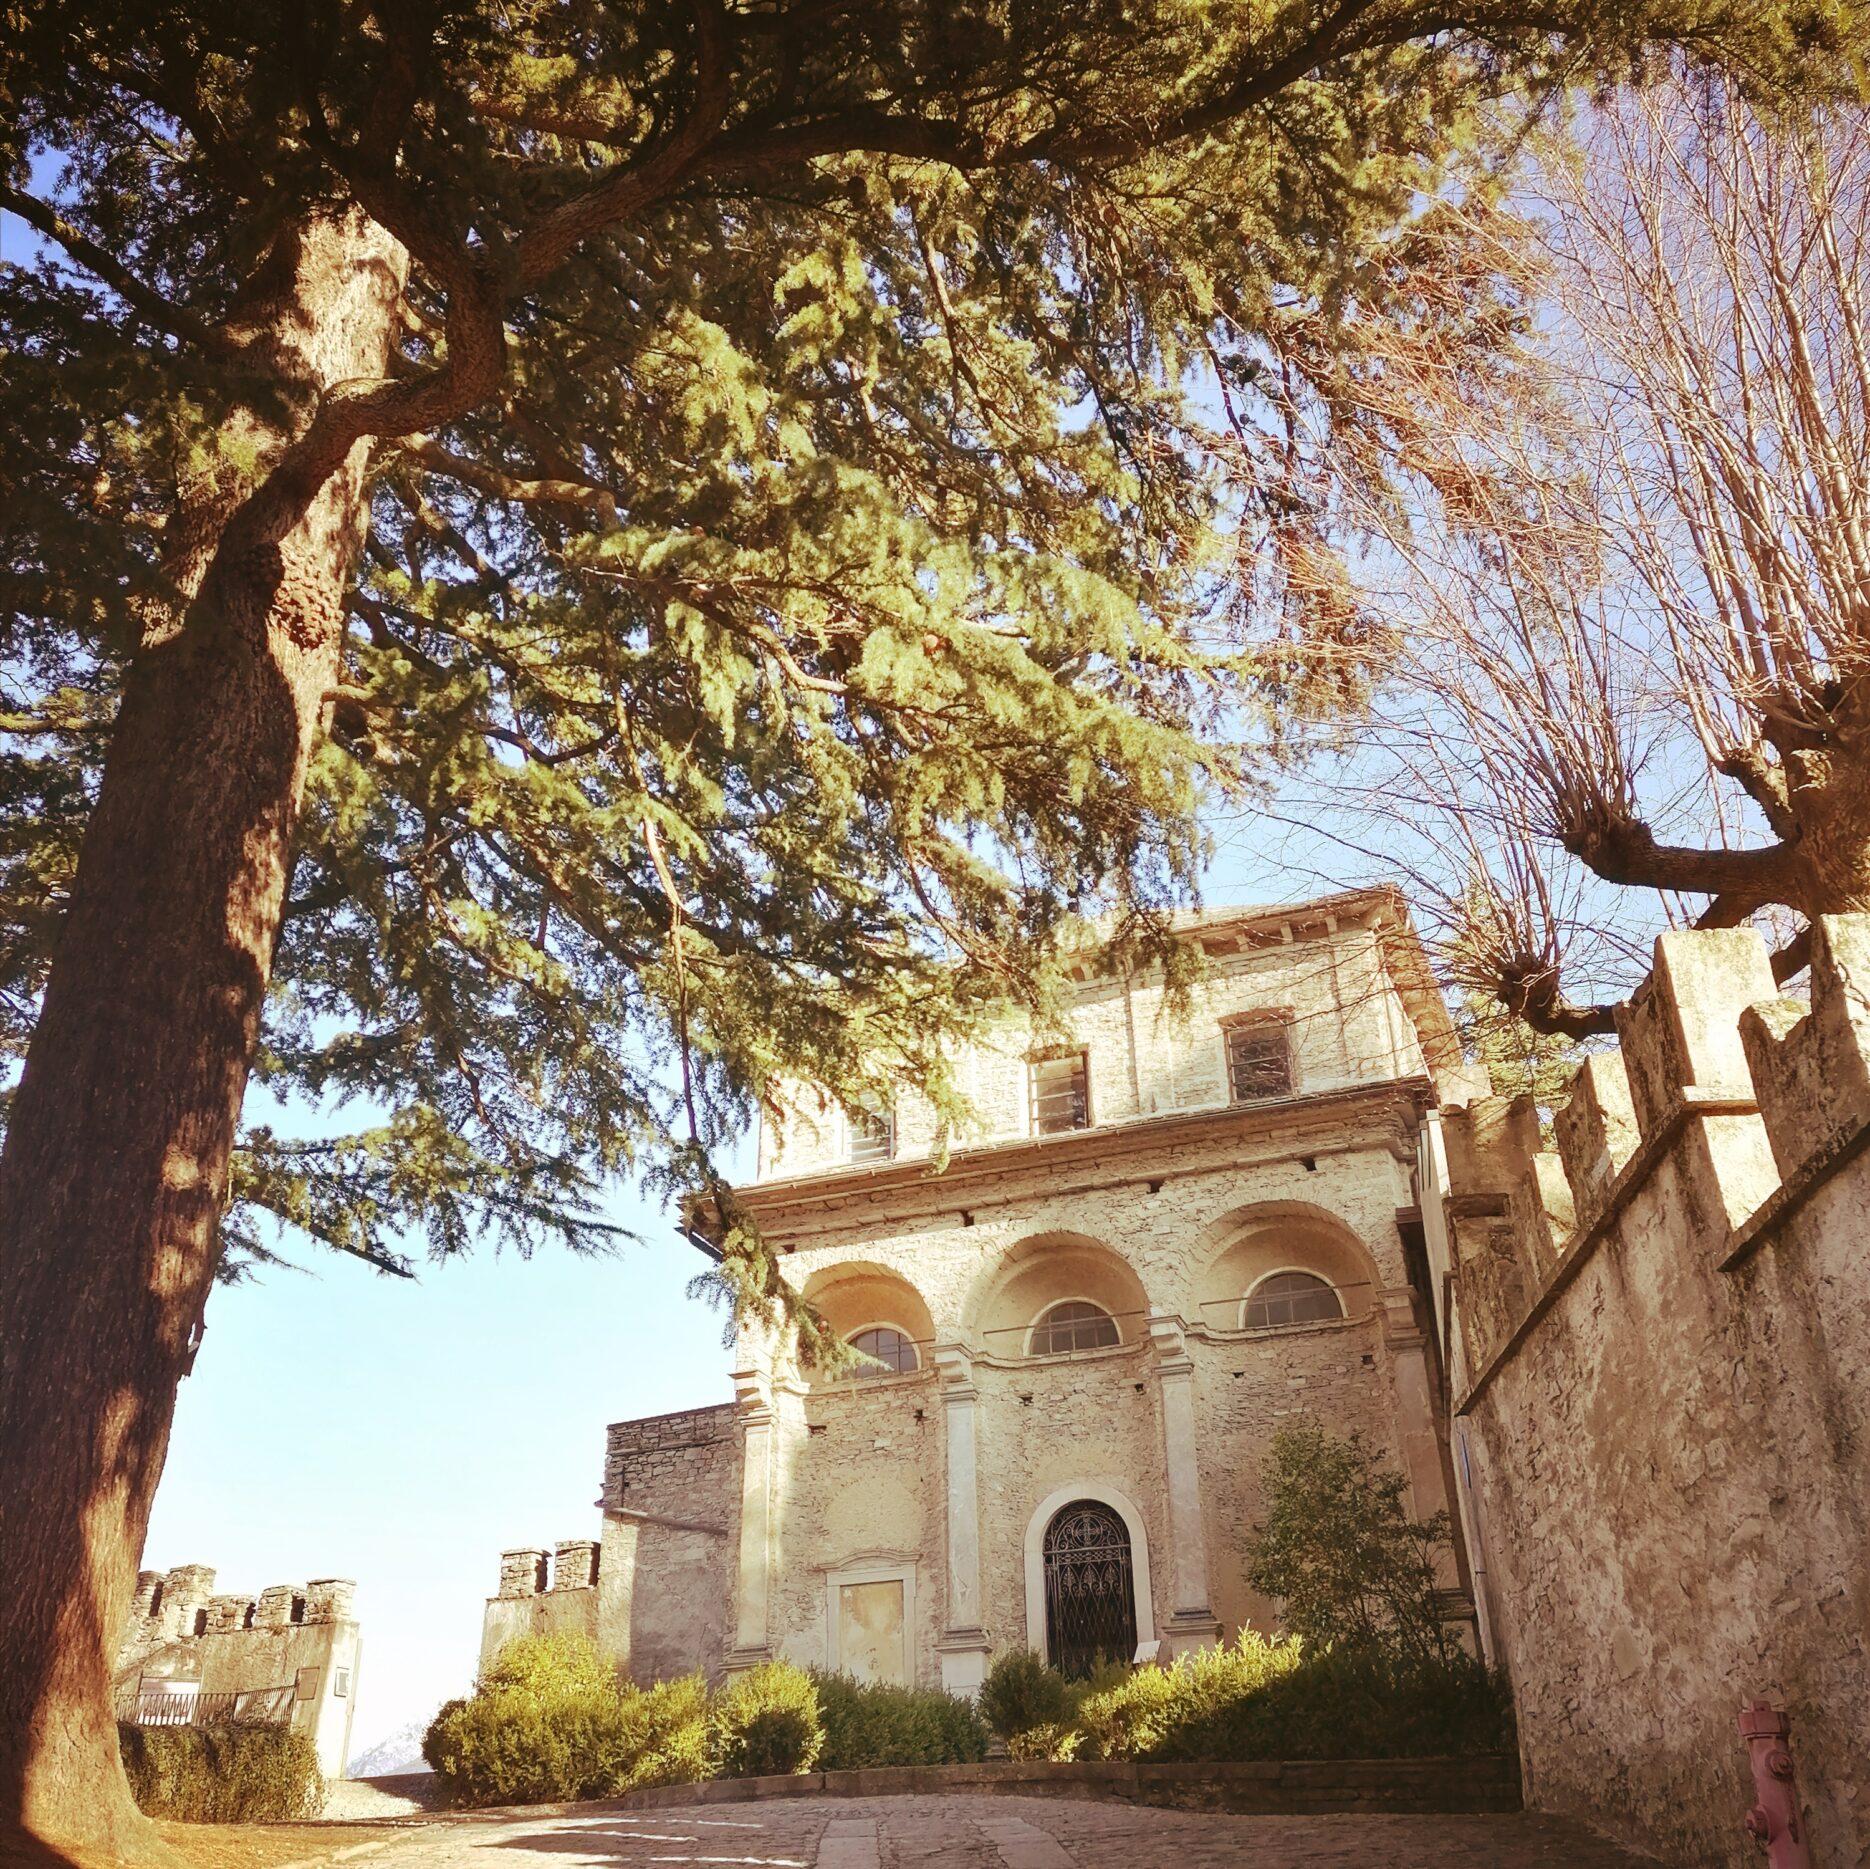 01.02.20 Sacro Monte Calvario